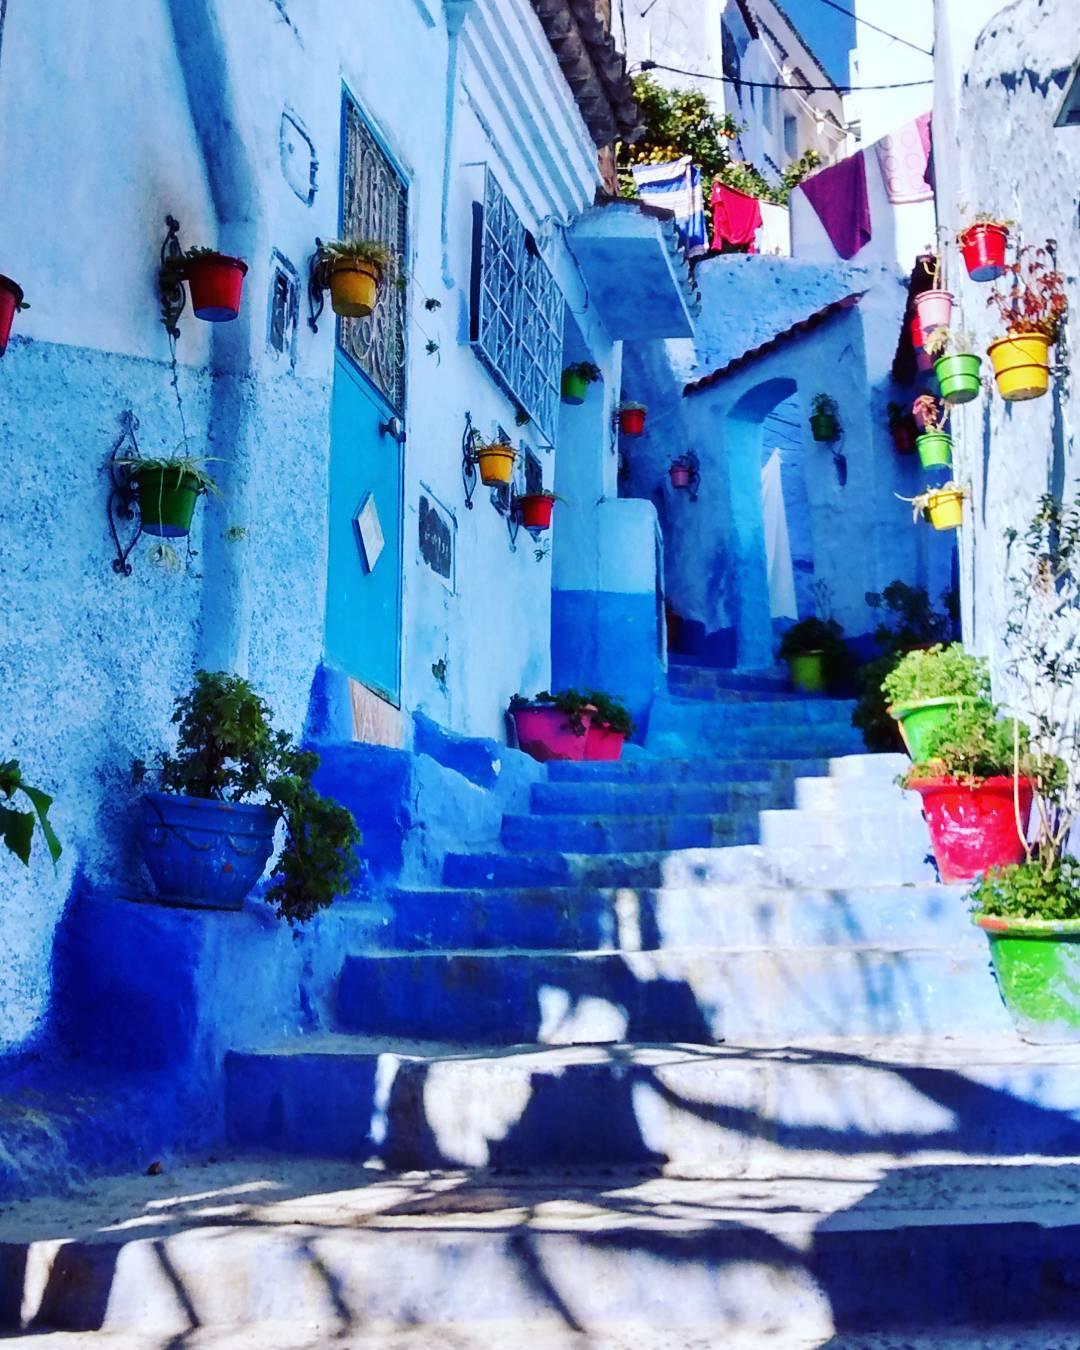 03-chefchaouen-marrocos